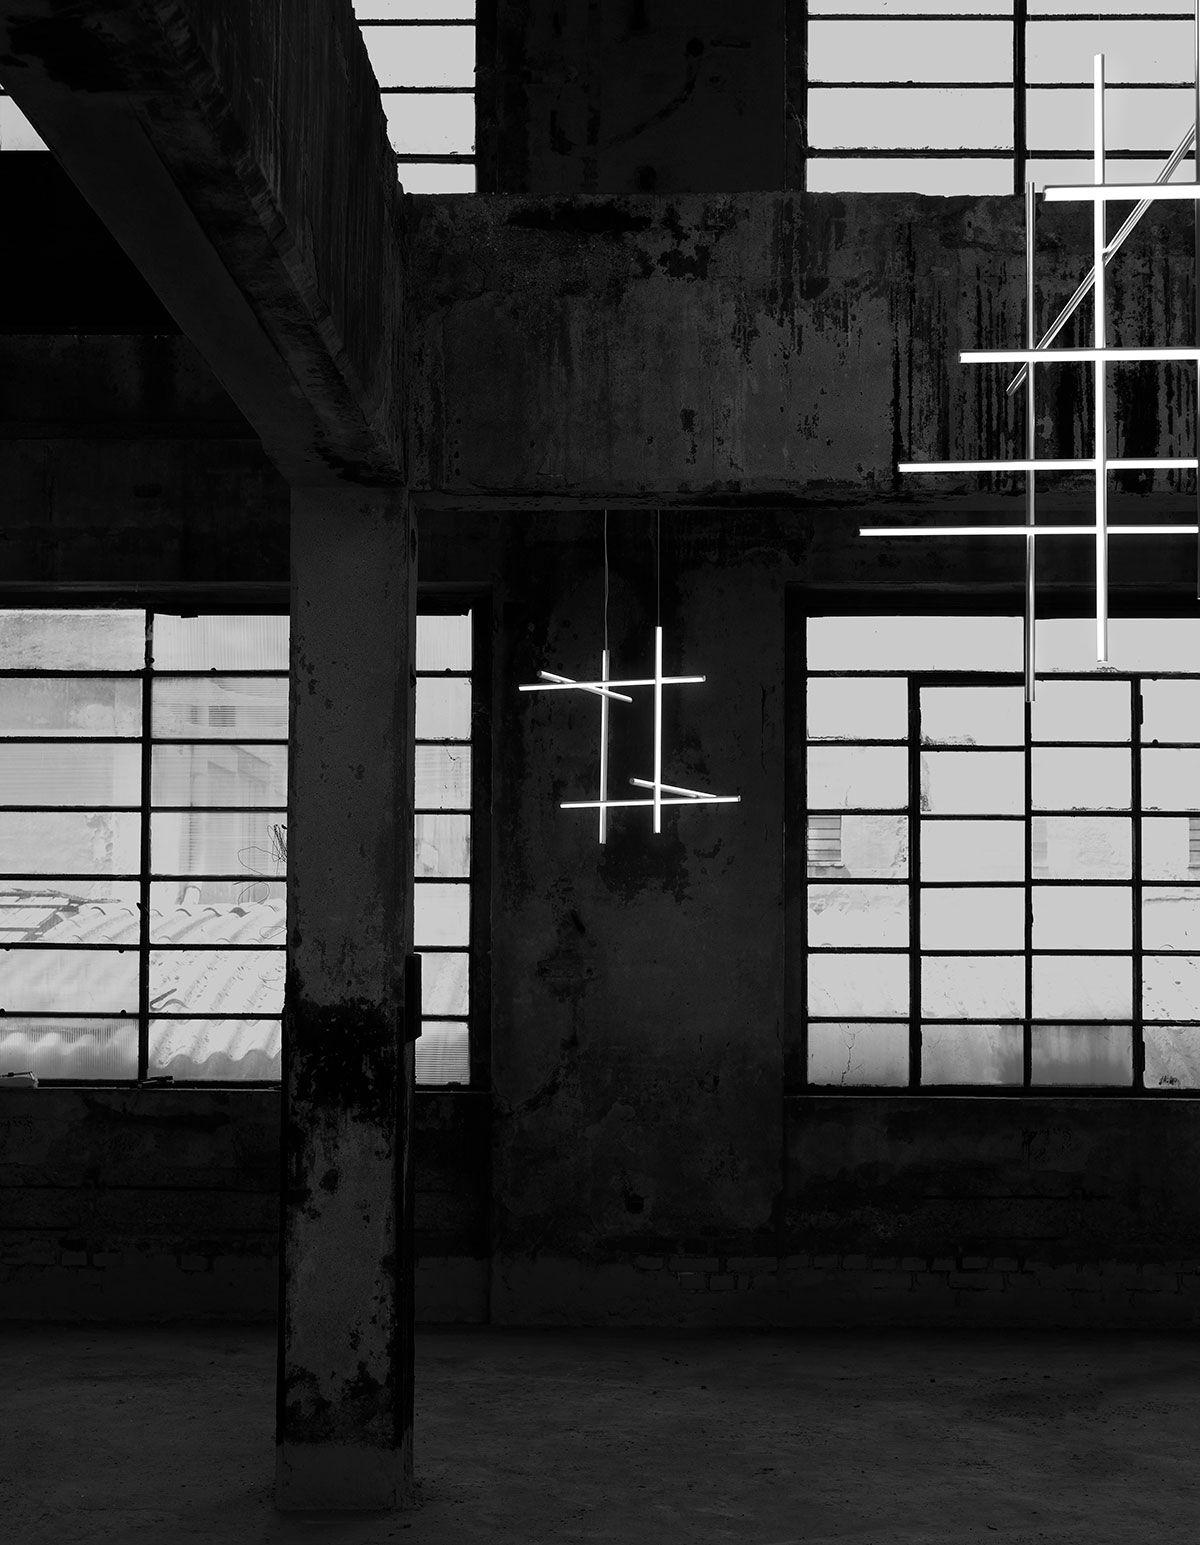 stories-coordinates-michael-anastassiades-flos-09